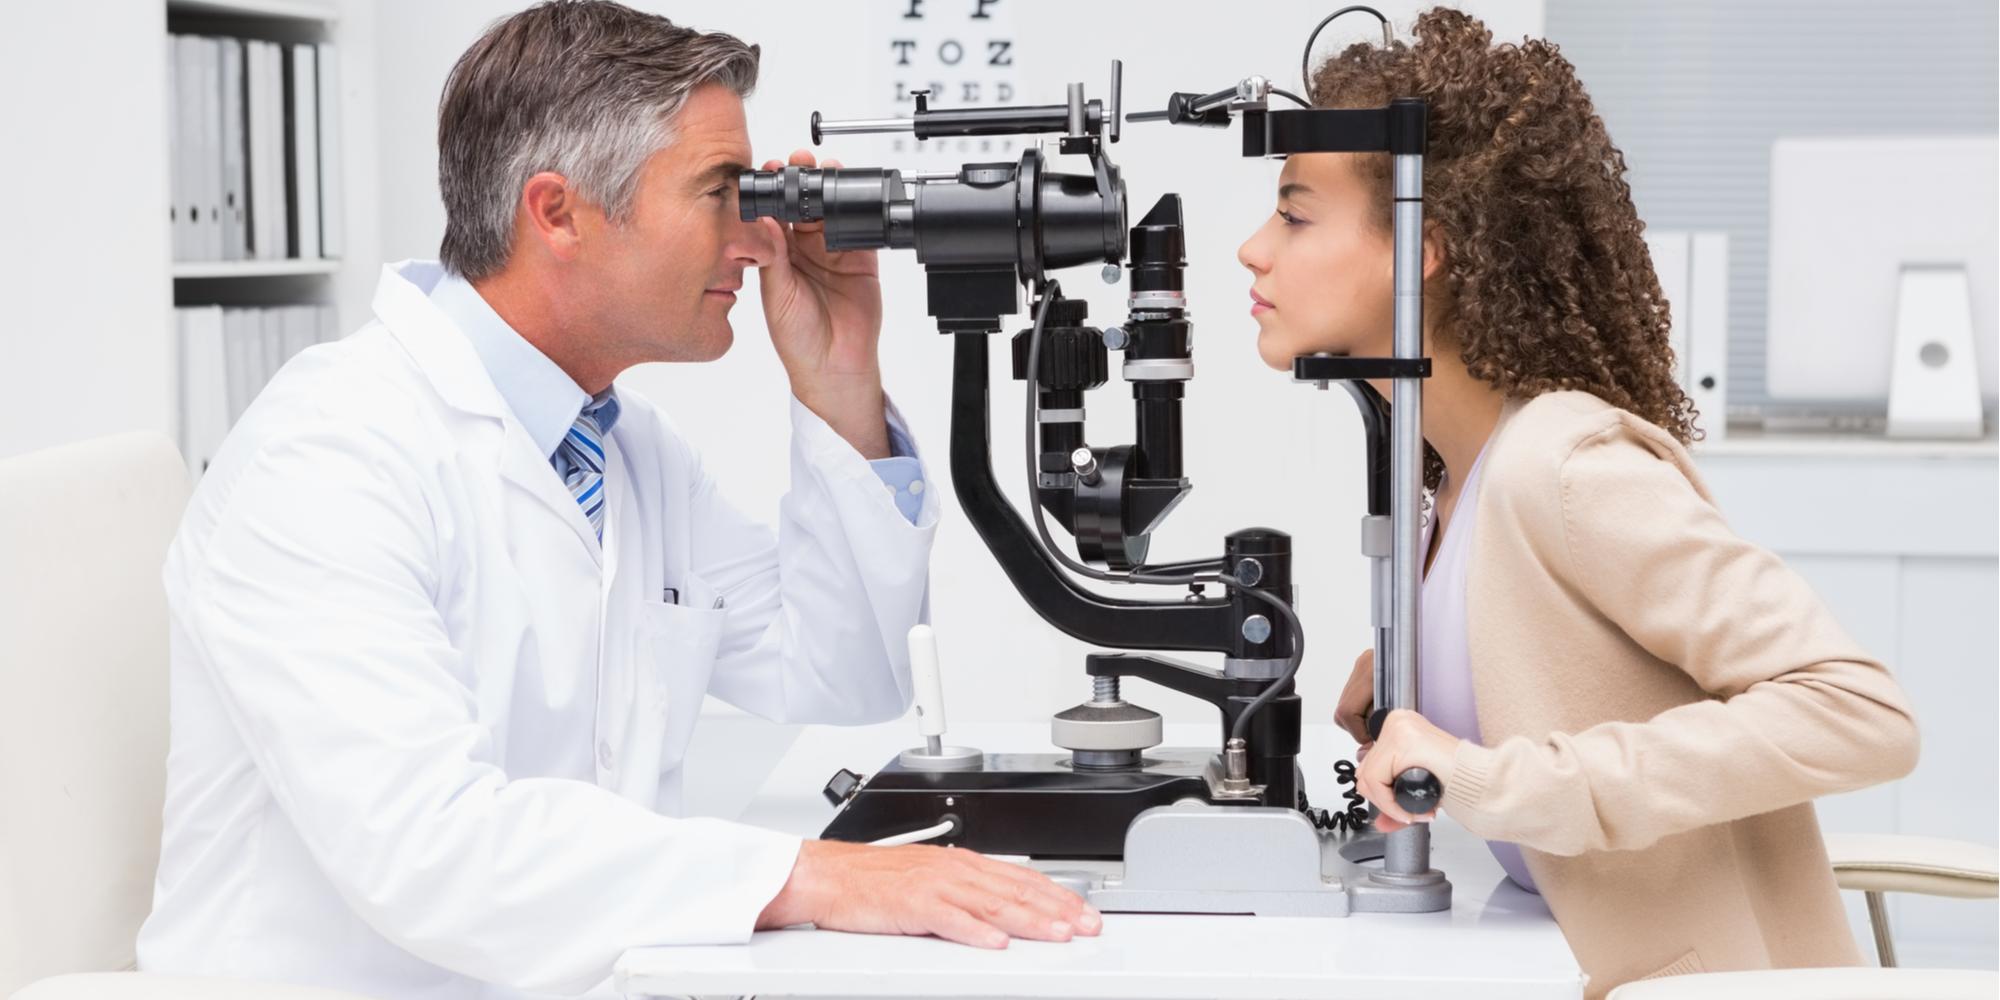 Why Do I Need an Eye Exam?